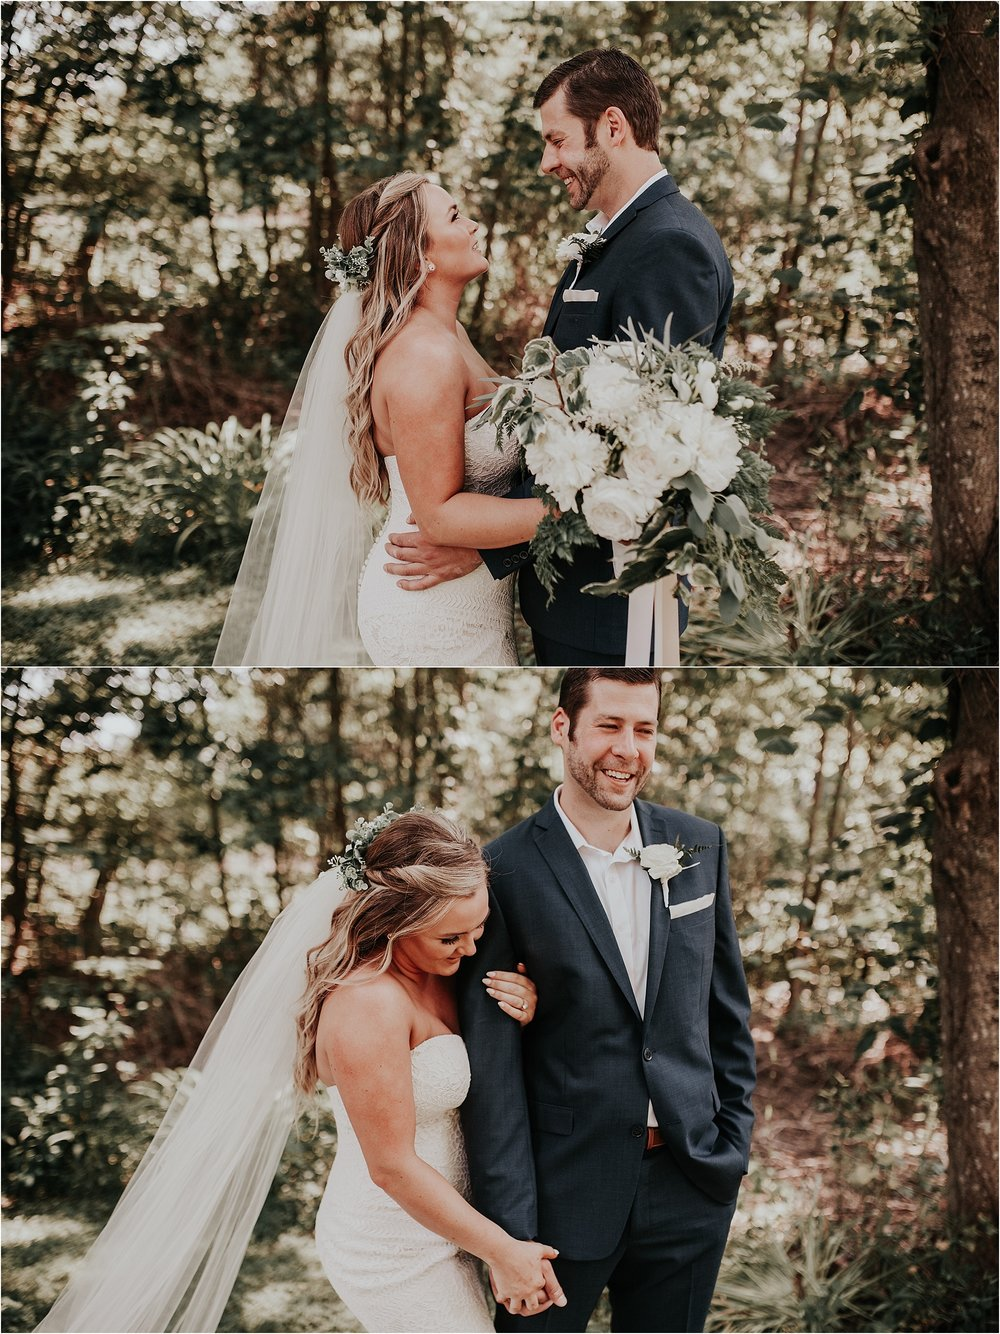 Valenzano_Winery_NJ_Wedding_Photographer_0010.jpg